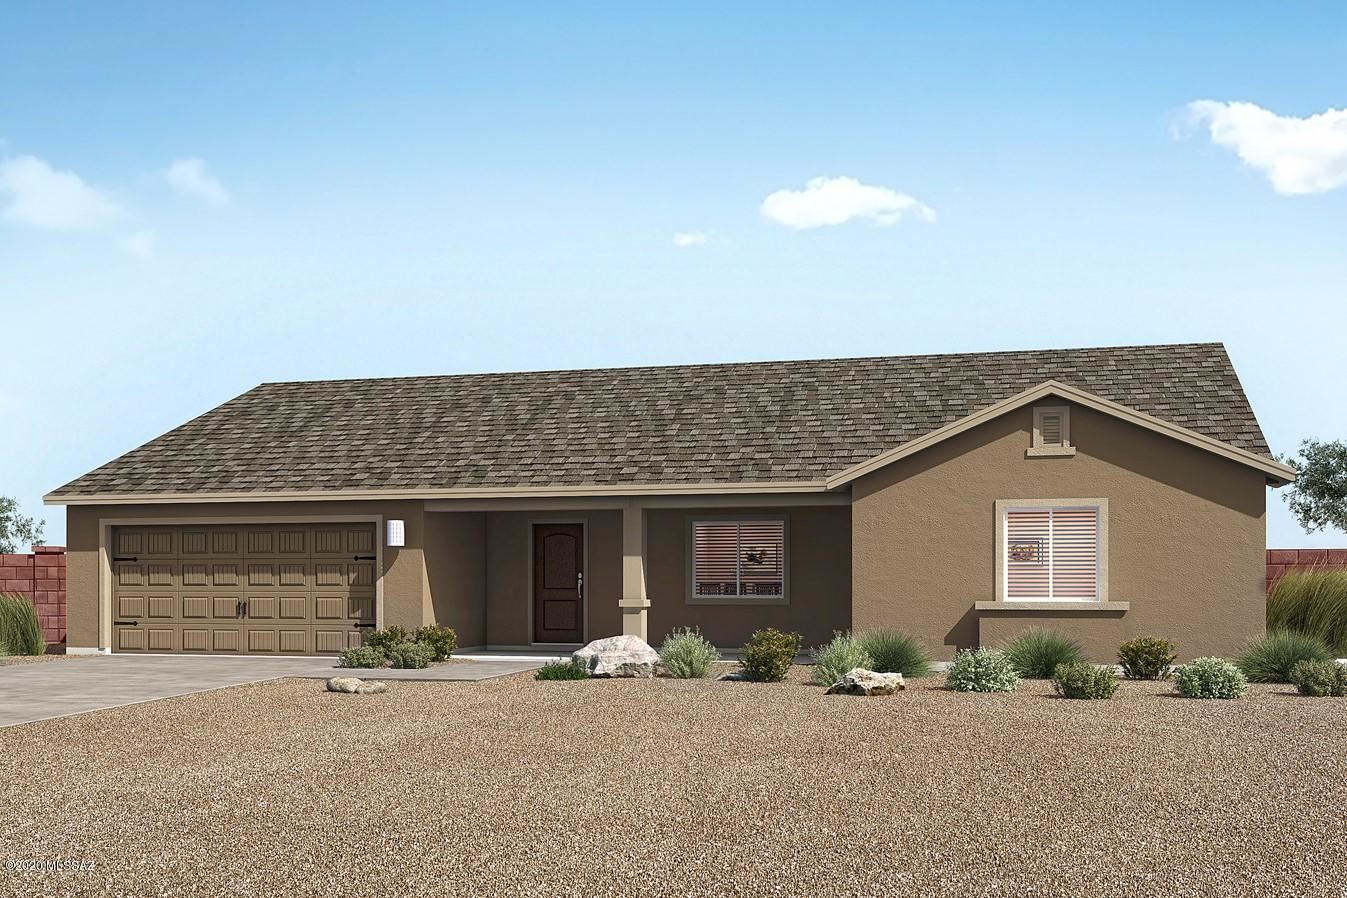 7060 S Victor Drive, Tucson, AZ 85757 - MLS#: 22016337